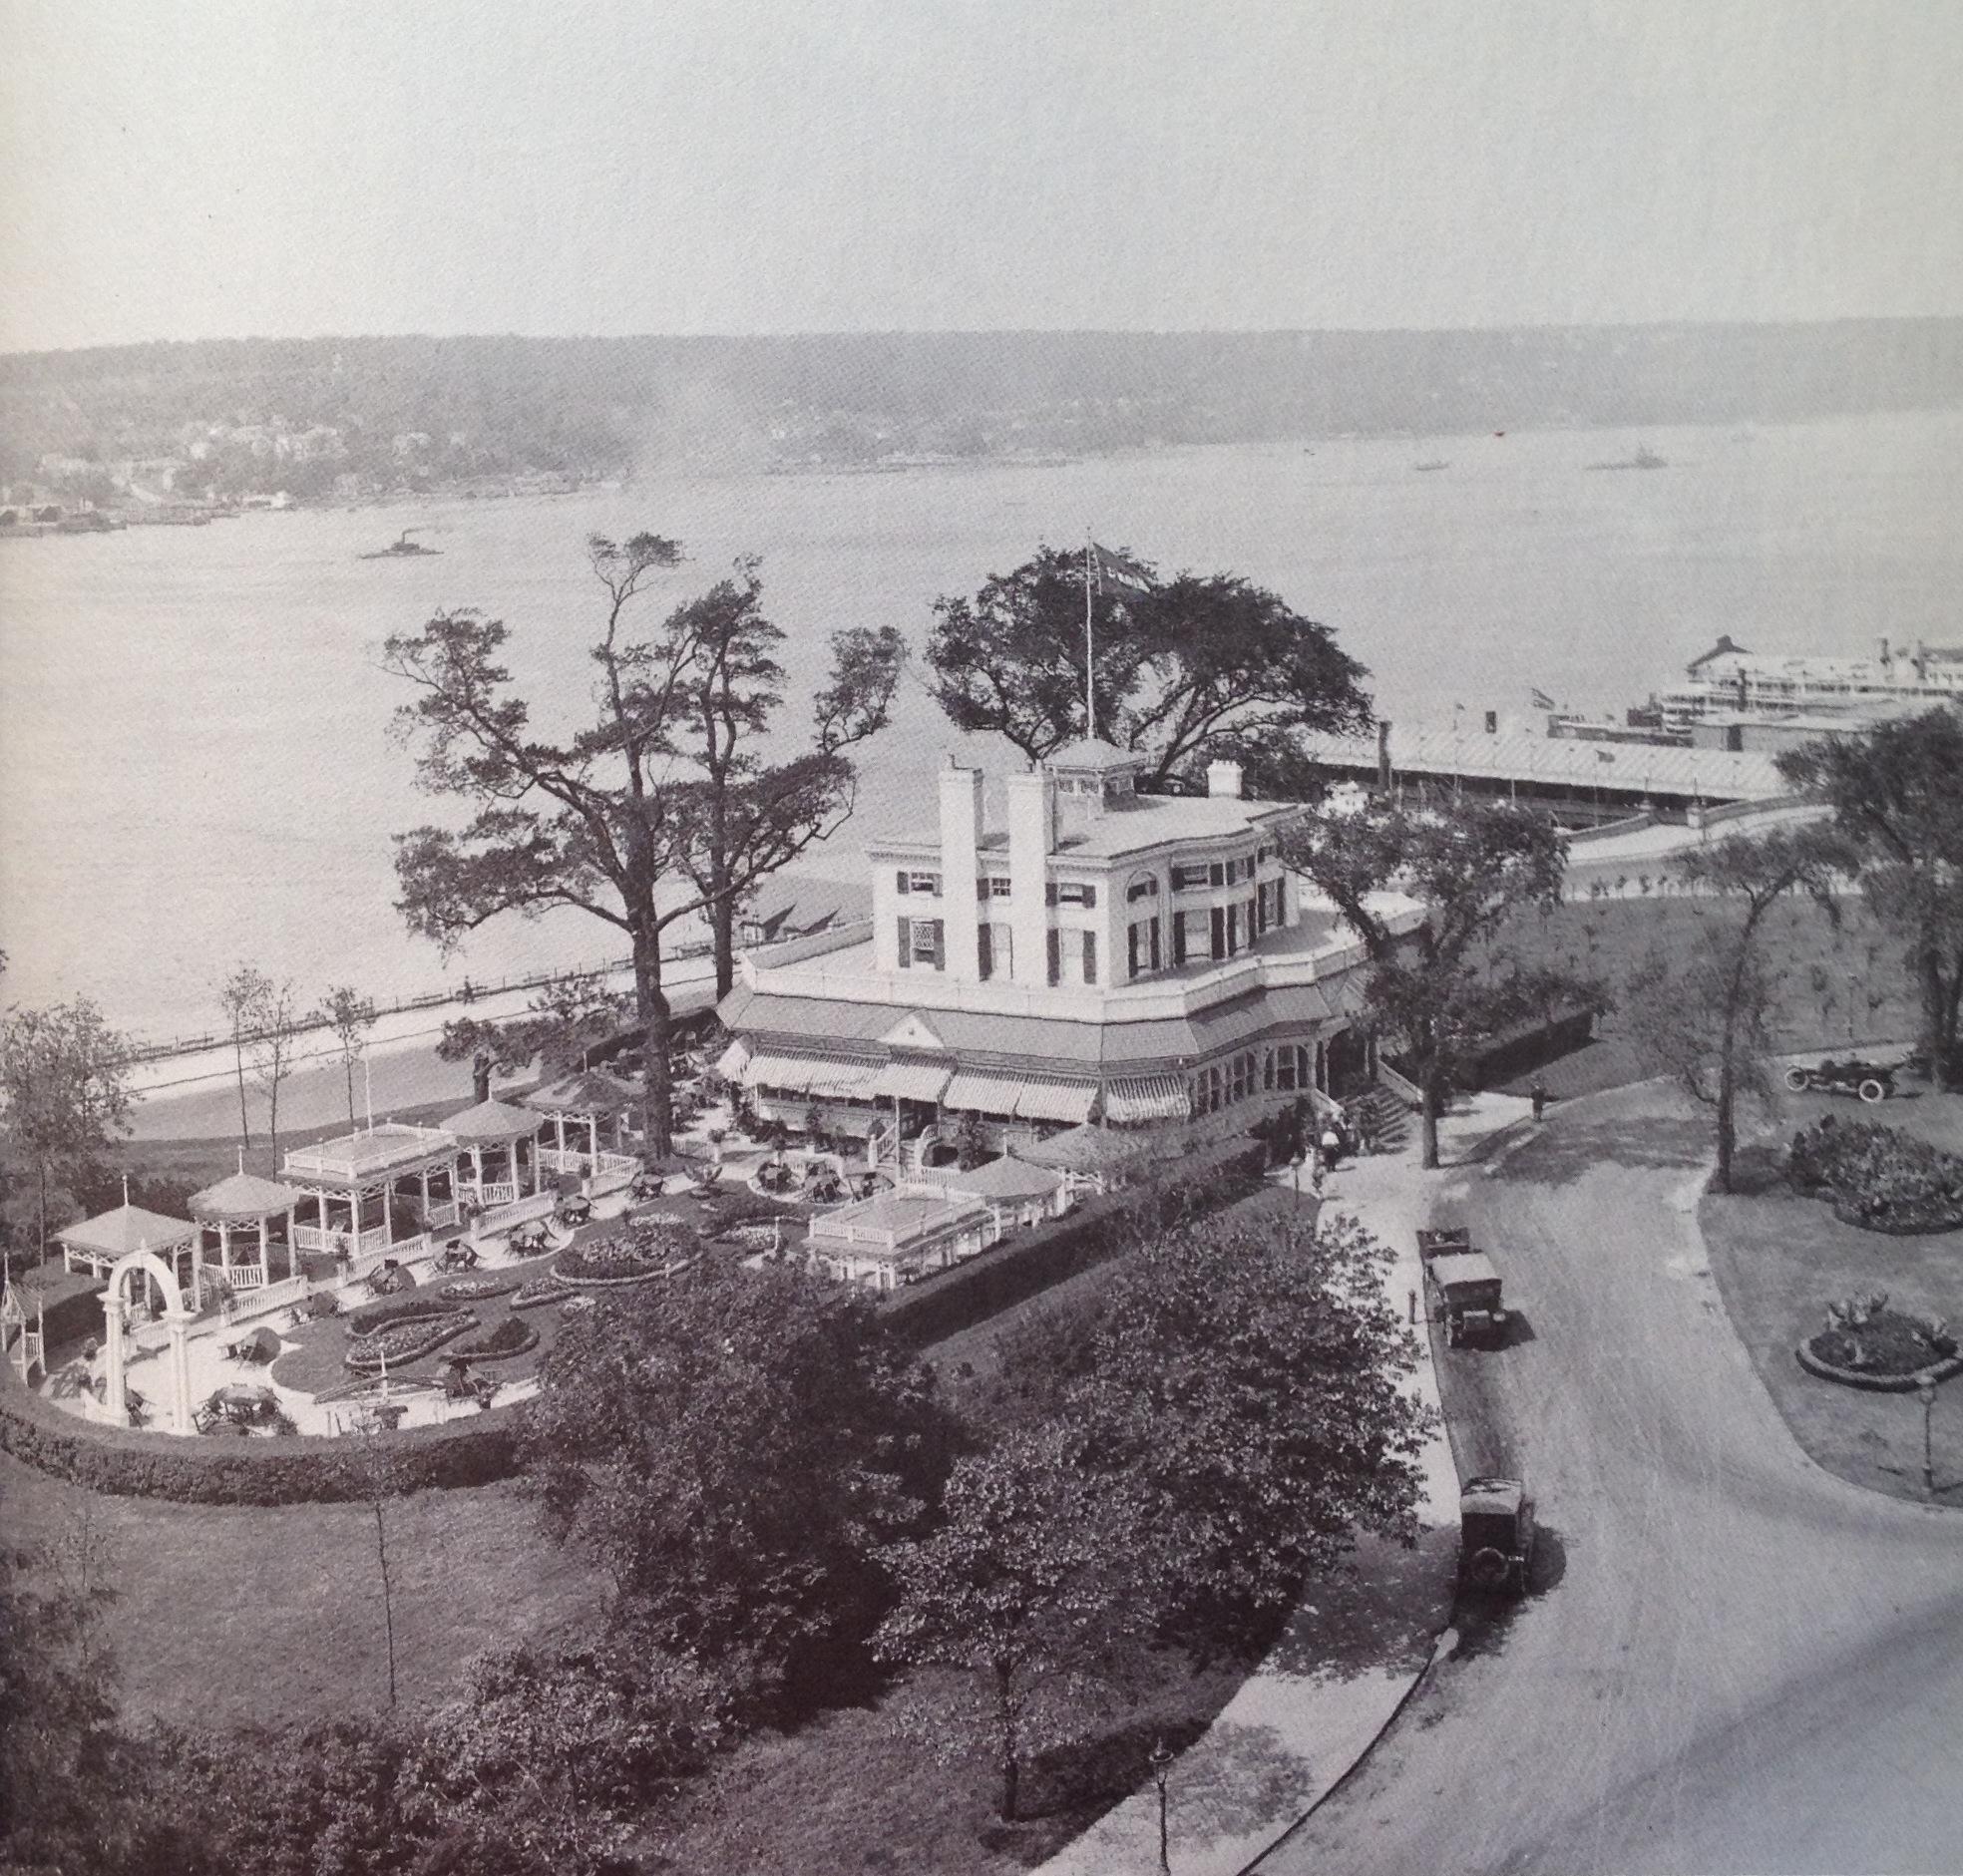 The Claremont Inn